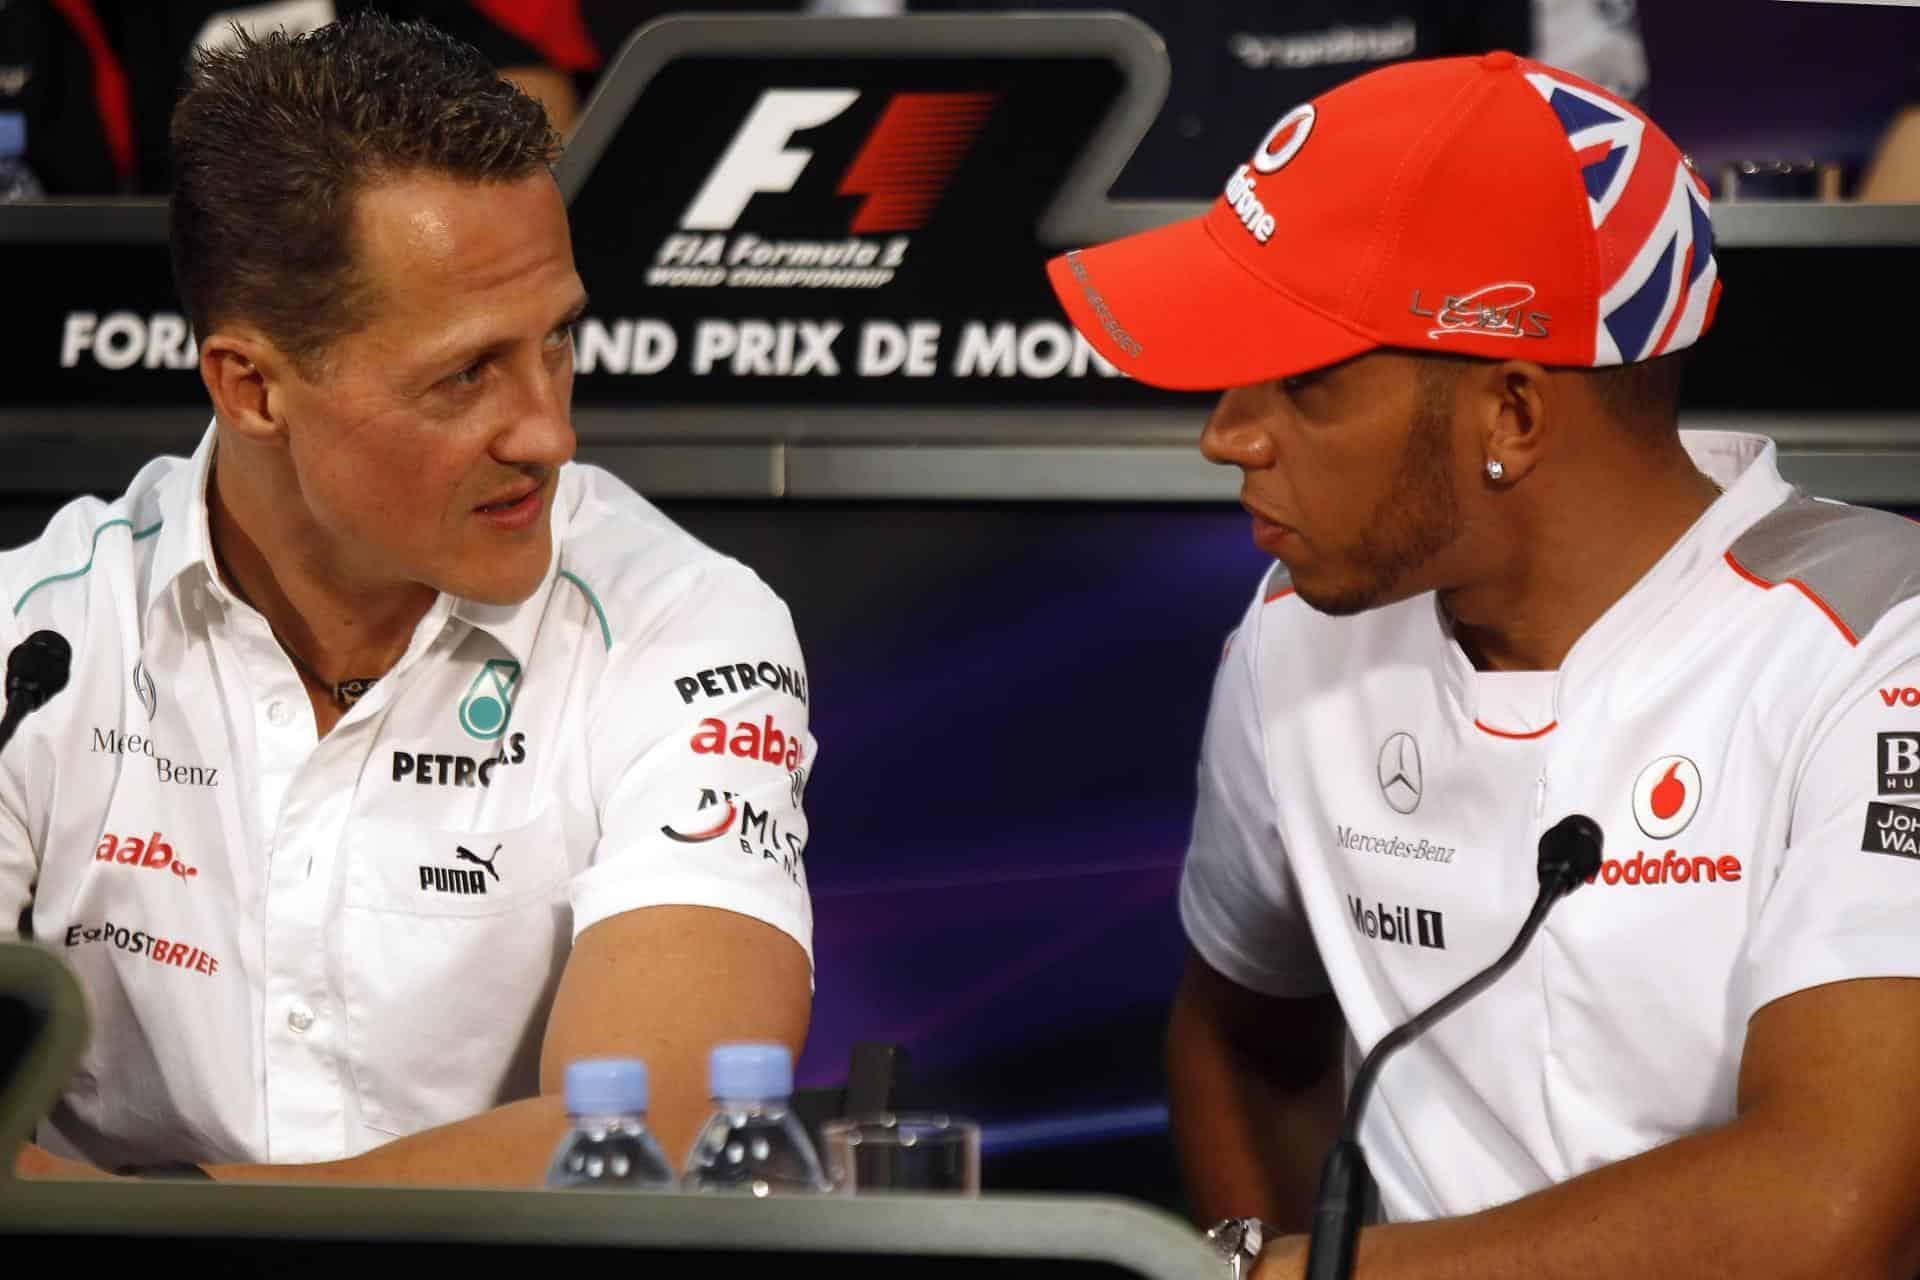 Michael Schumacher Lewis Hamilton Monaco GP F1 2012 press conference